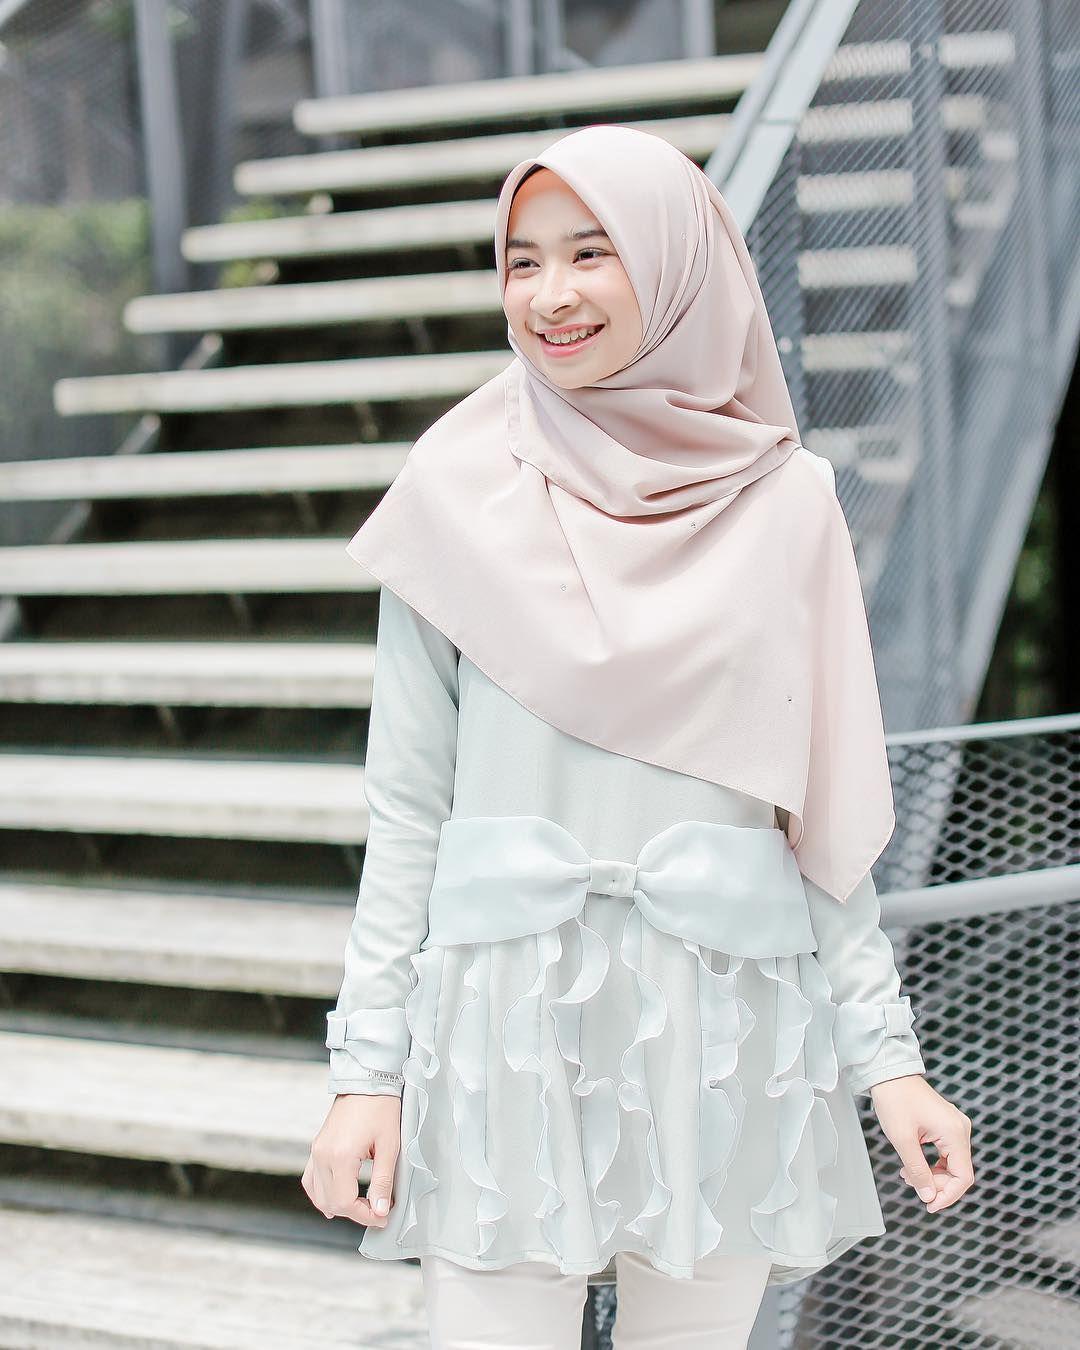 Pin By Krazix On Awek Tudung Hijab Girl Pinterest Lgs Regular Fit Kemeja Casual Gingham Abu Muda L Fashion Muslimah Style Dresses Outfit